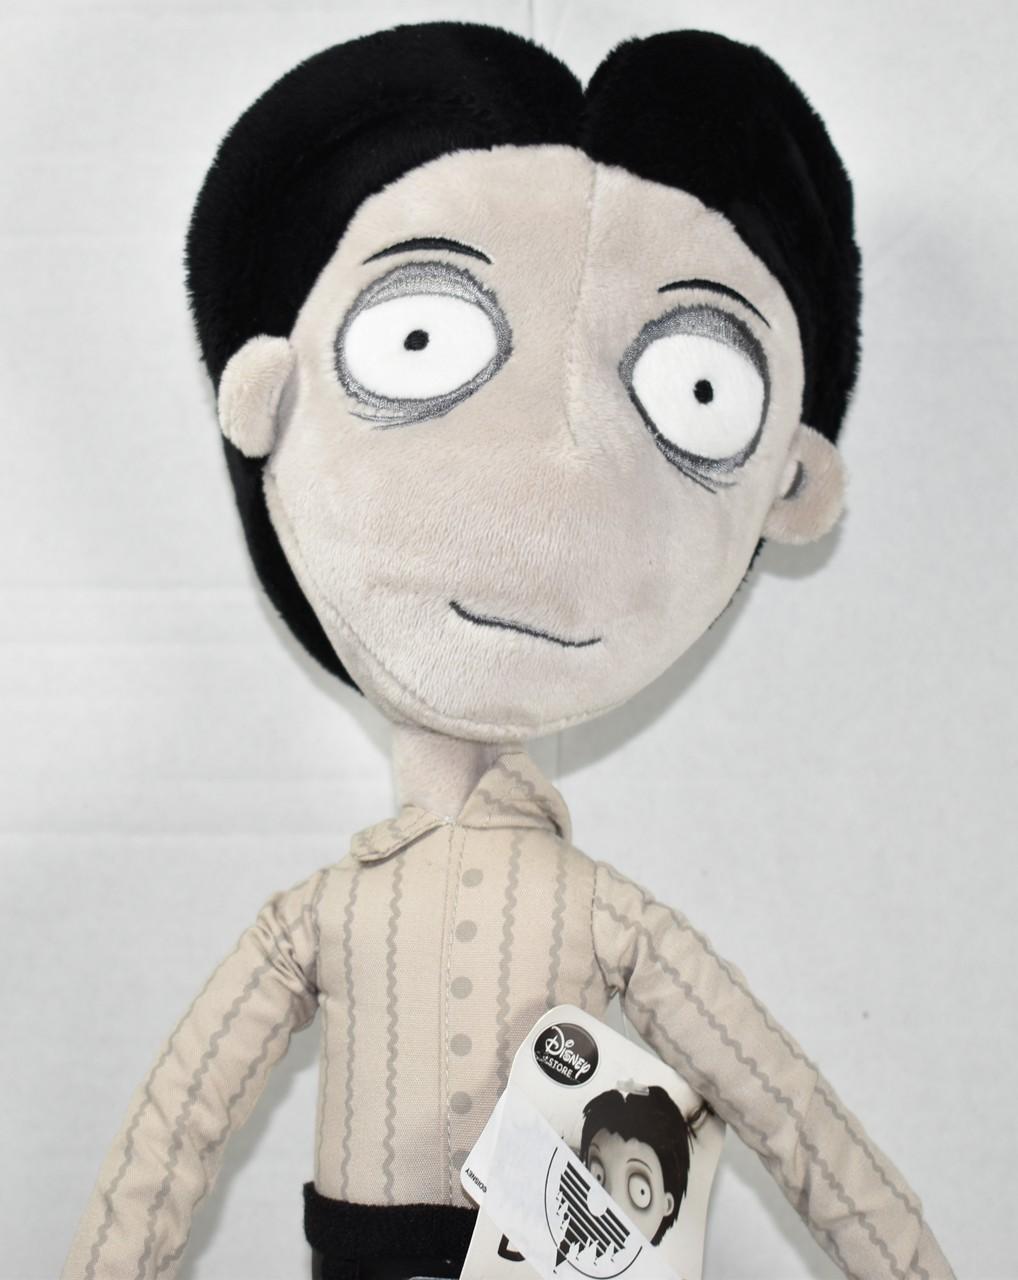 Disney Store Tim Burton S Frankenweenie Victor Frankenstein Plush Toy New Nwt Ebay